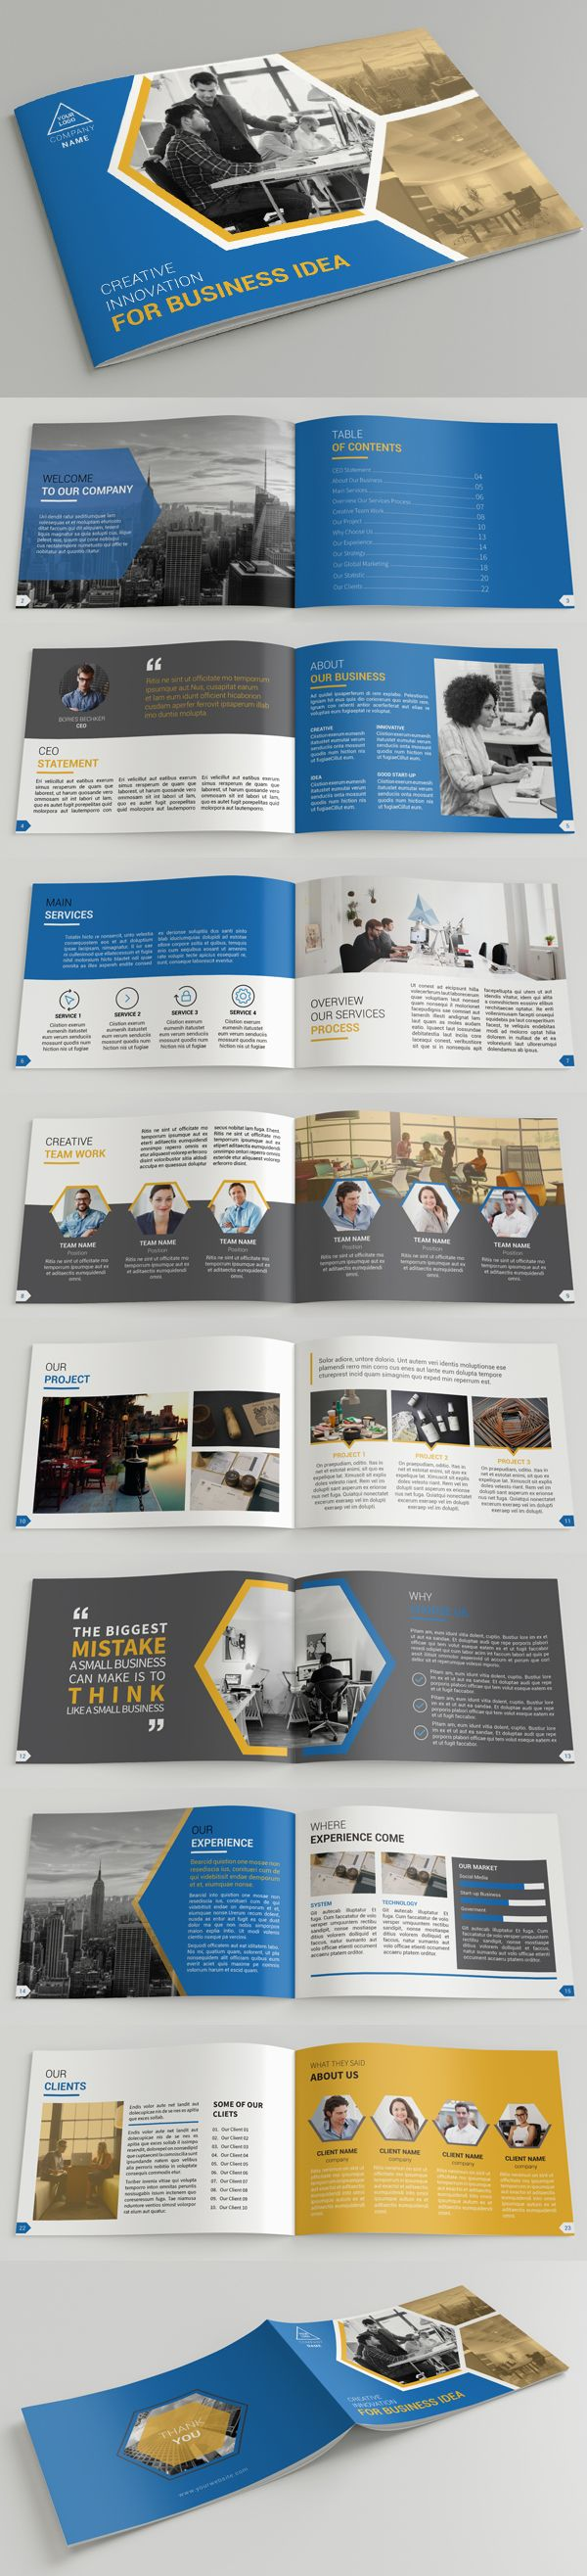 Creative A5 Company Profile Brochure Template #annualreport #booklet #brochuredesign #brochuretemplates #fashioncatalog #catalogdesign